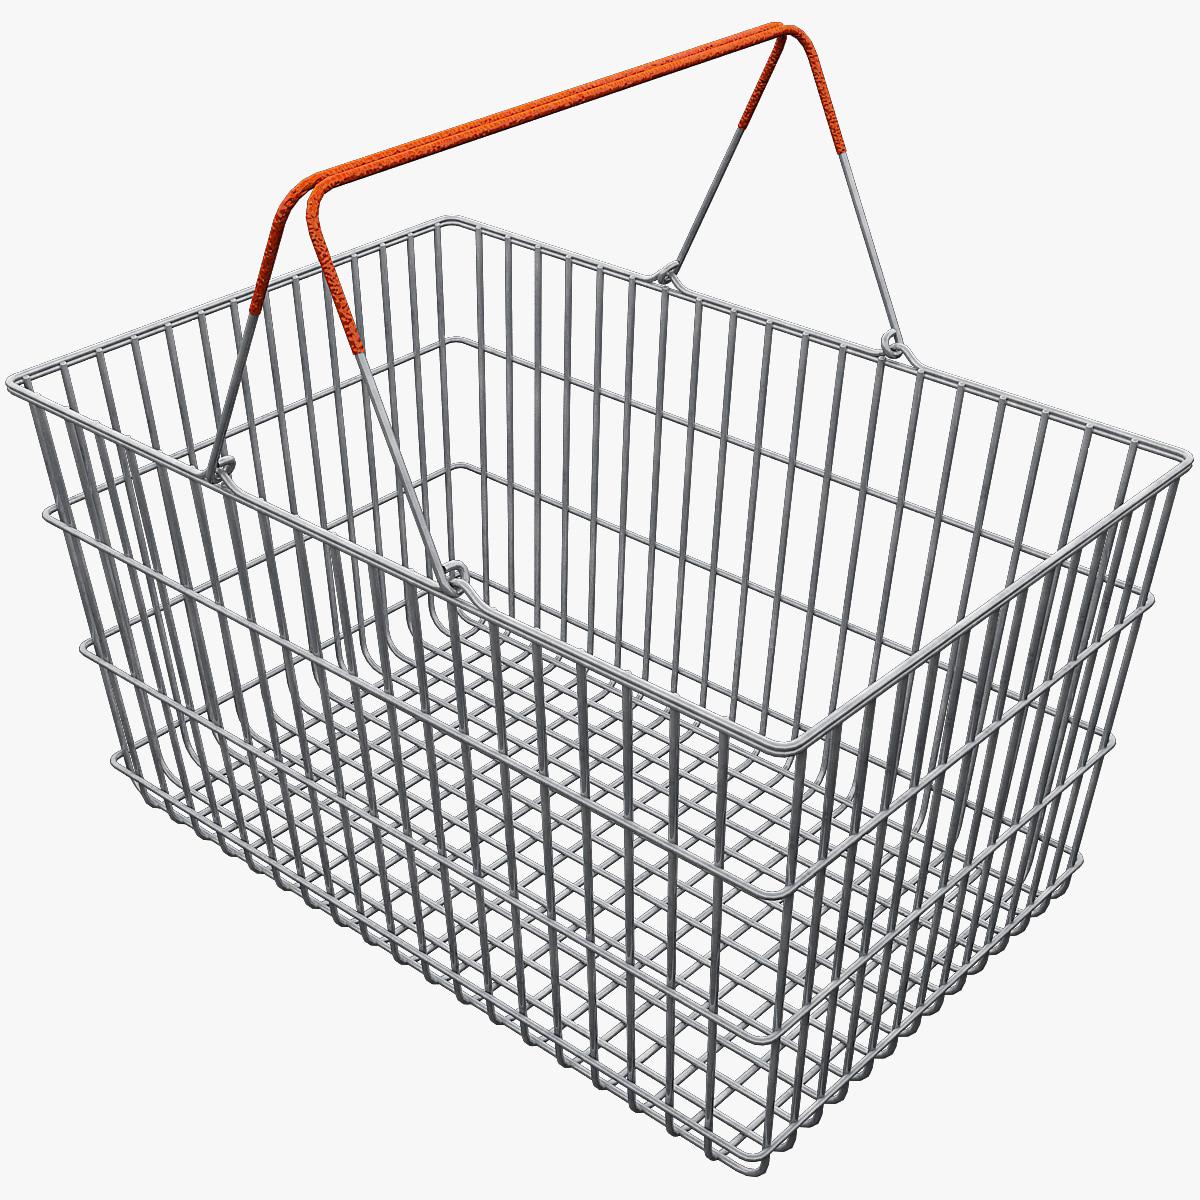 Supermarket_Shopping_Basket_Vray.jpg